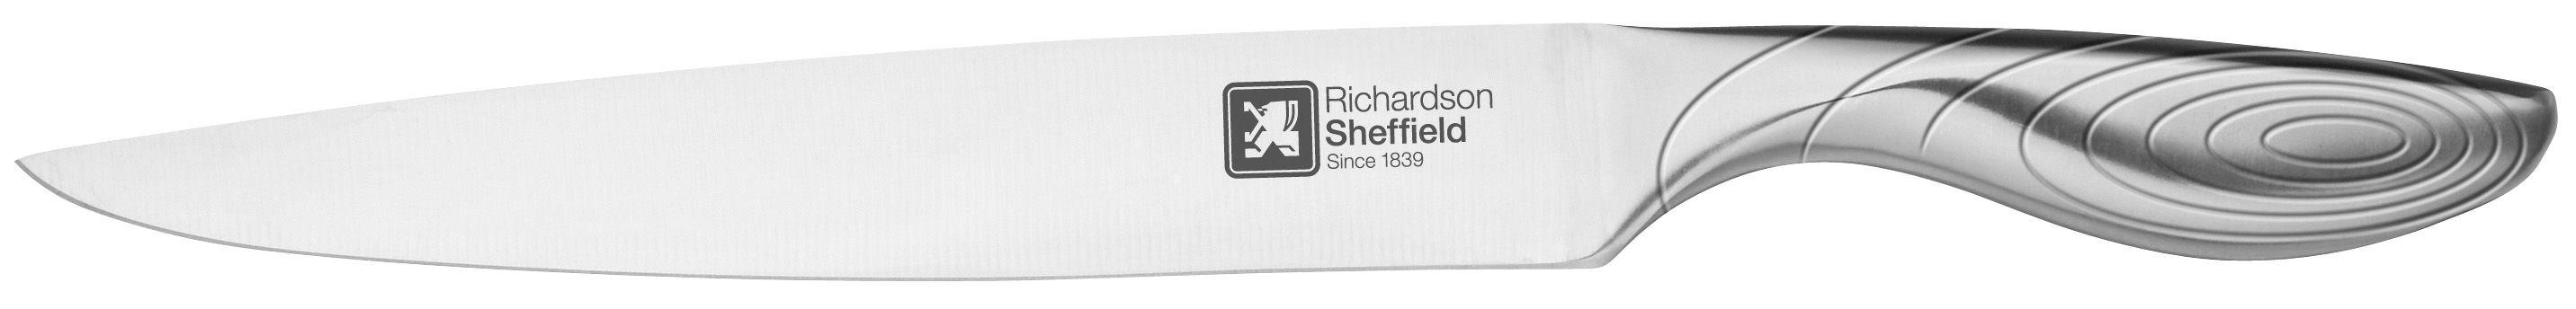 richard_sheffield_vleesmes_forme_contours_20_cm.jpg